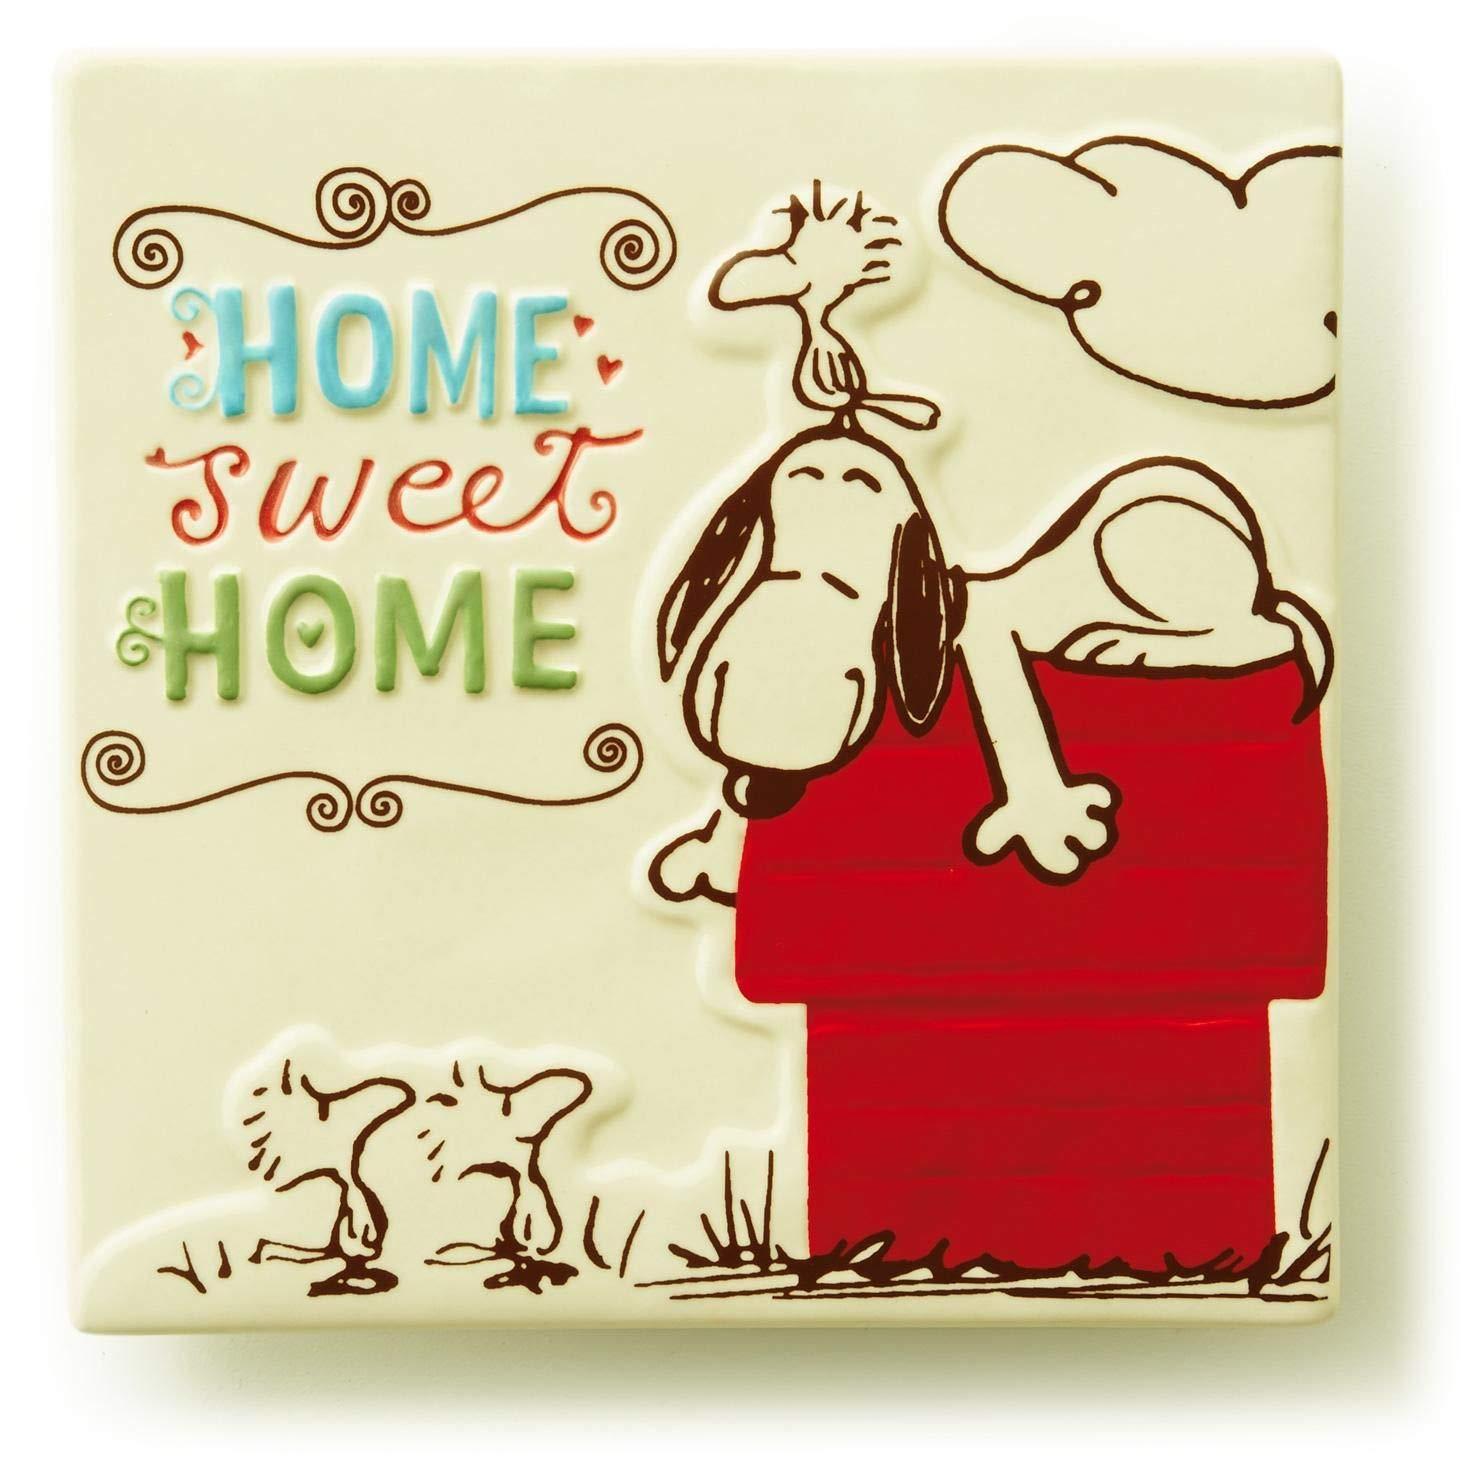 Hallmark Home Sweet Home Ceramic Tile Plaques & Signs PAJ4634